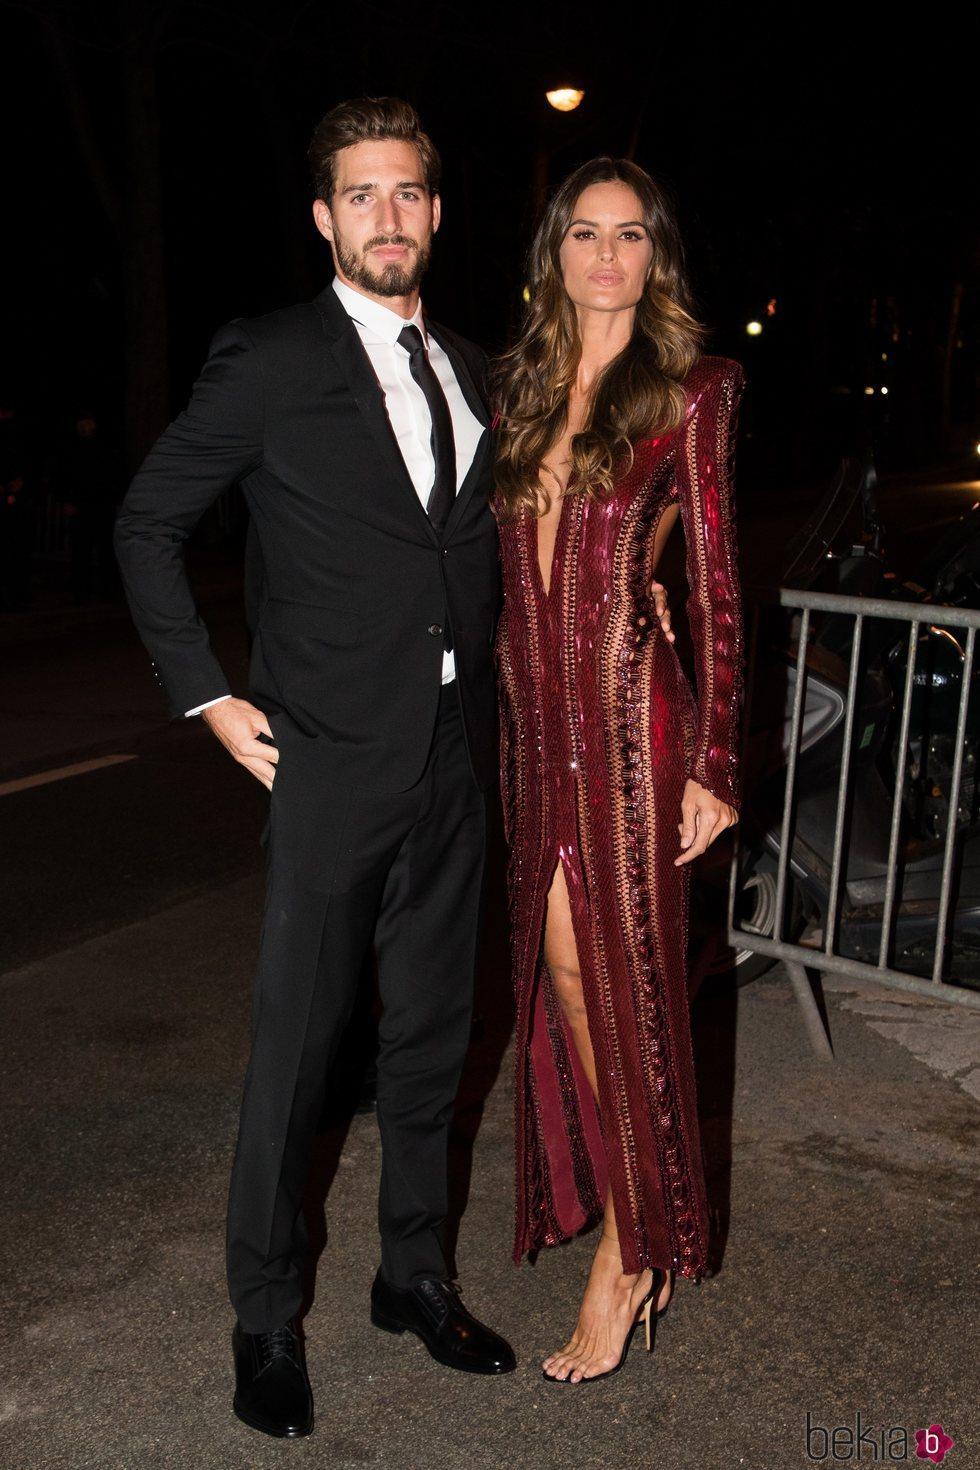 Kevin Trapp y Izabel Goulart  en la fiesta de cumpleaños de Neymar